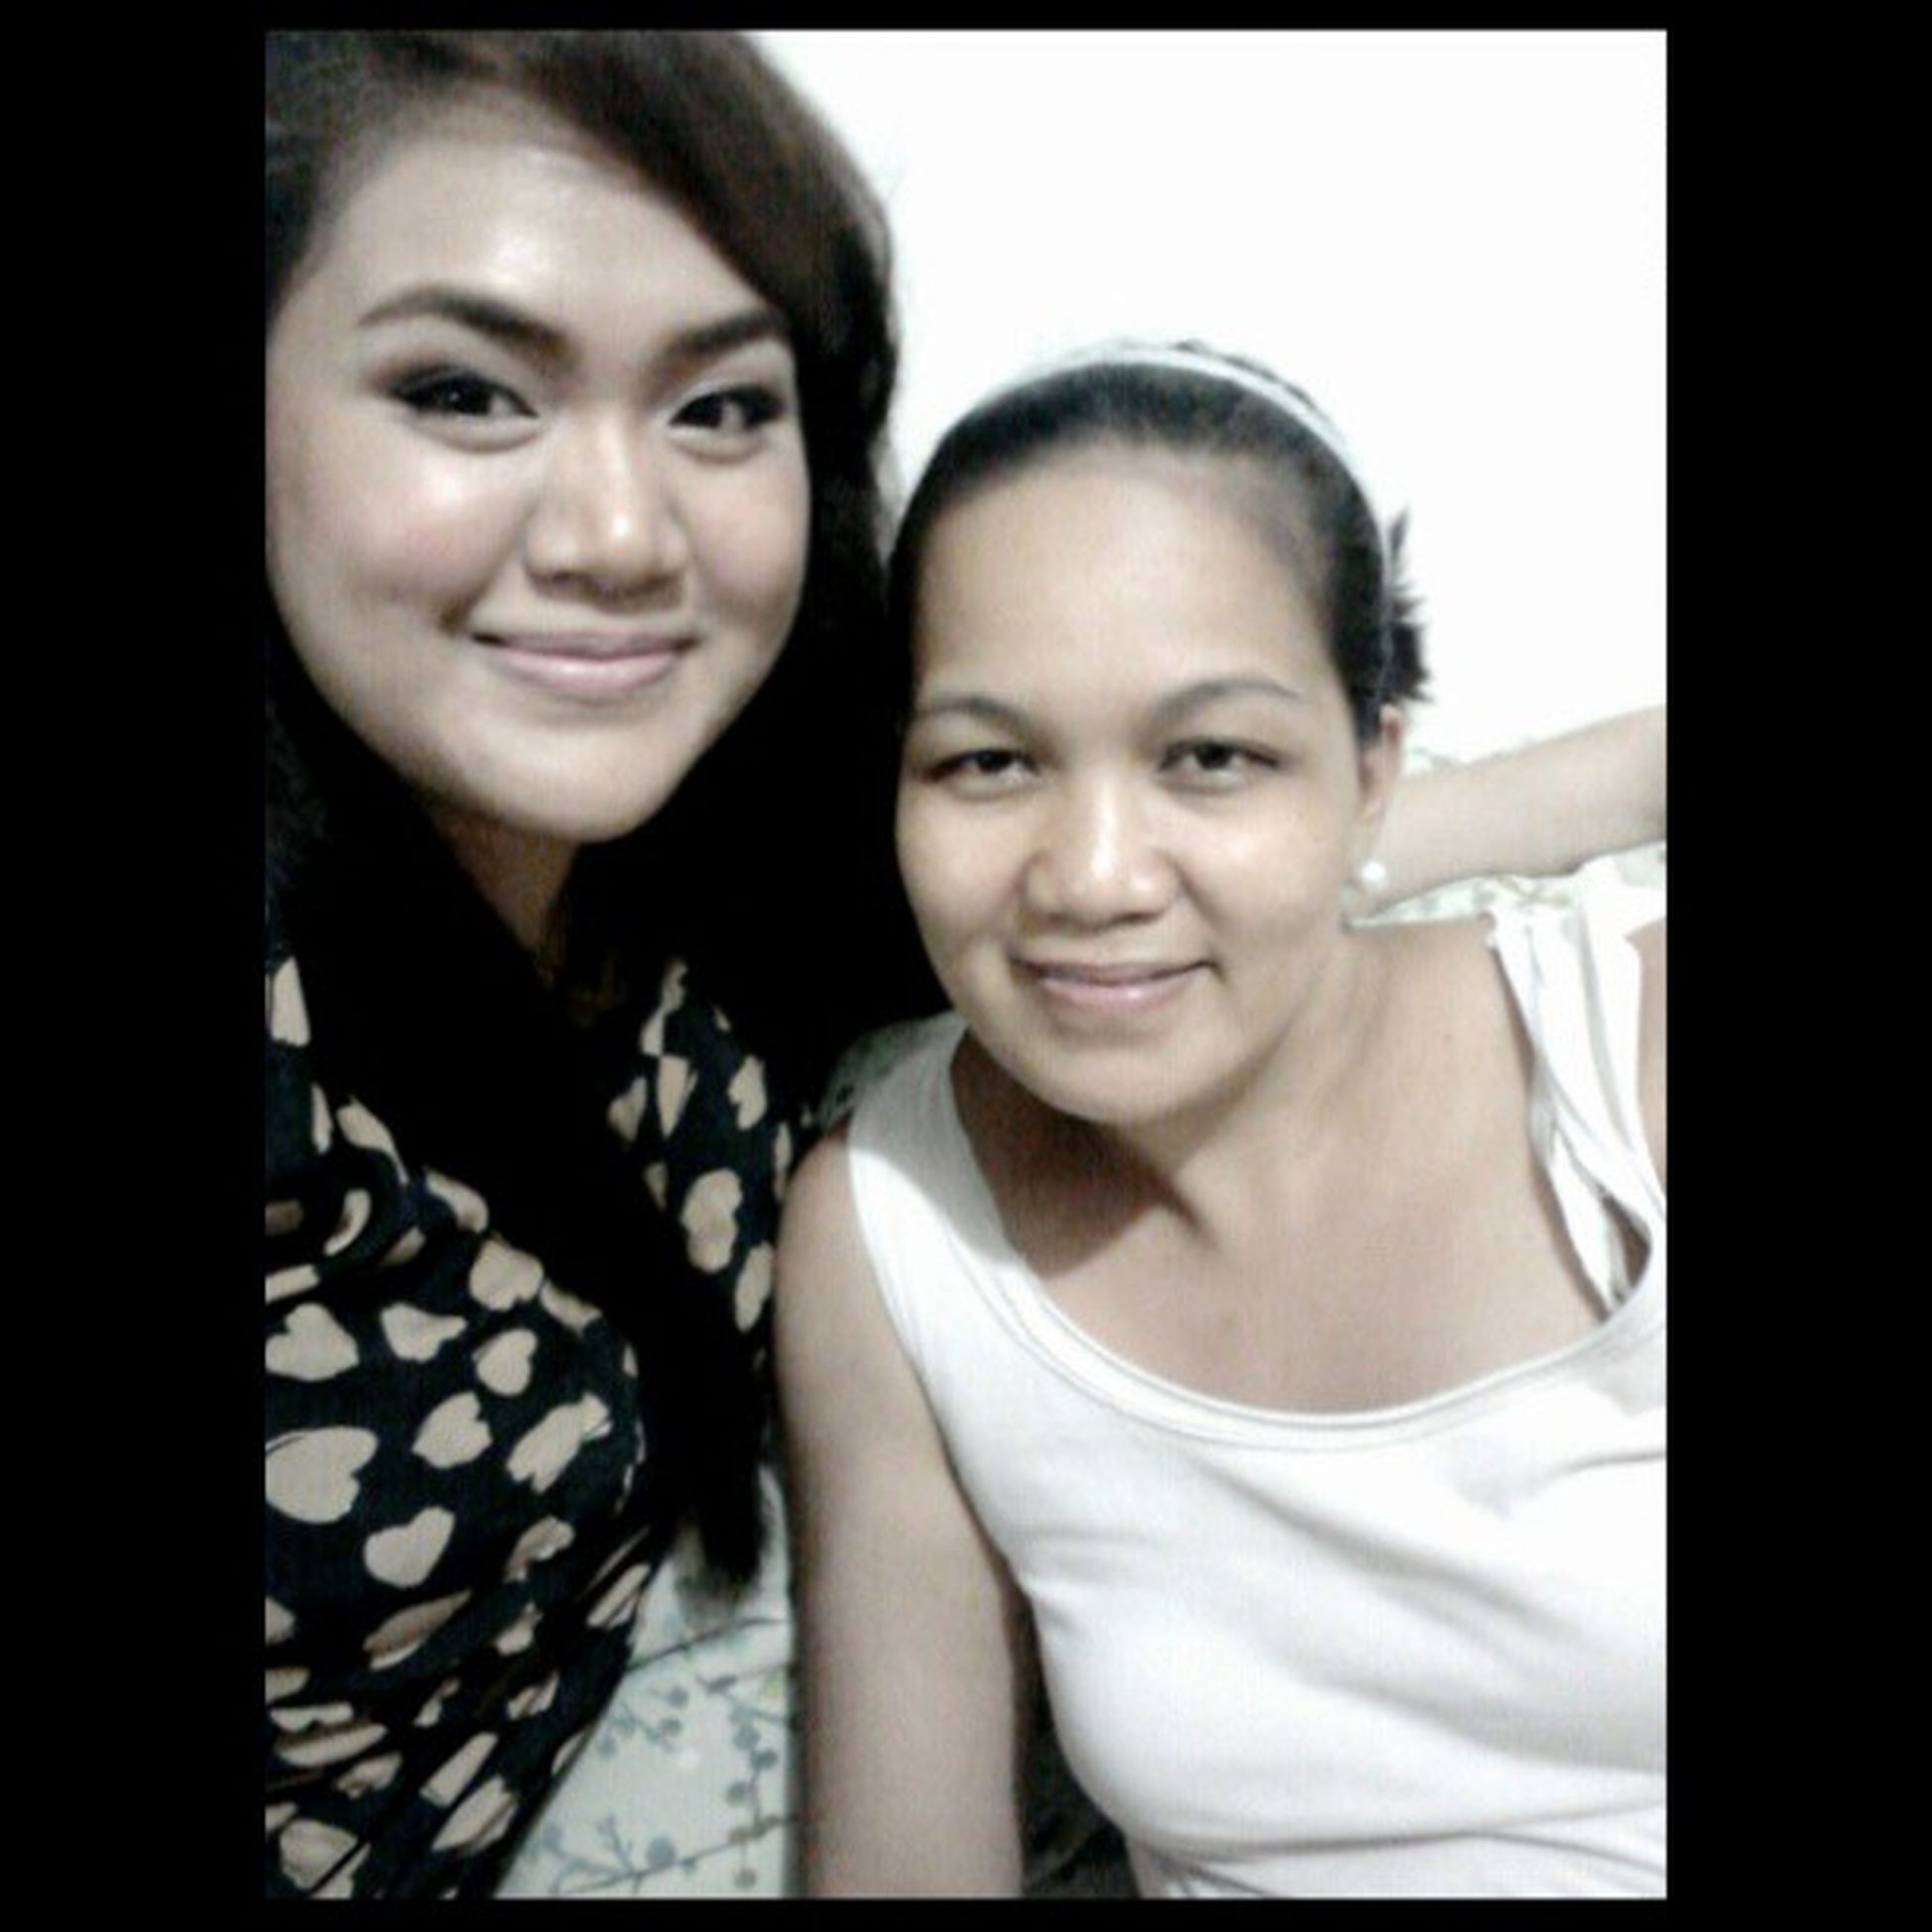 NOD with cousin! Cousins  Fambam Duty Allnighters igerspinay filipina pinoy TFLers tagsforlikes l4l f4f igerslaguna 2013 kik